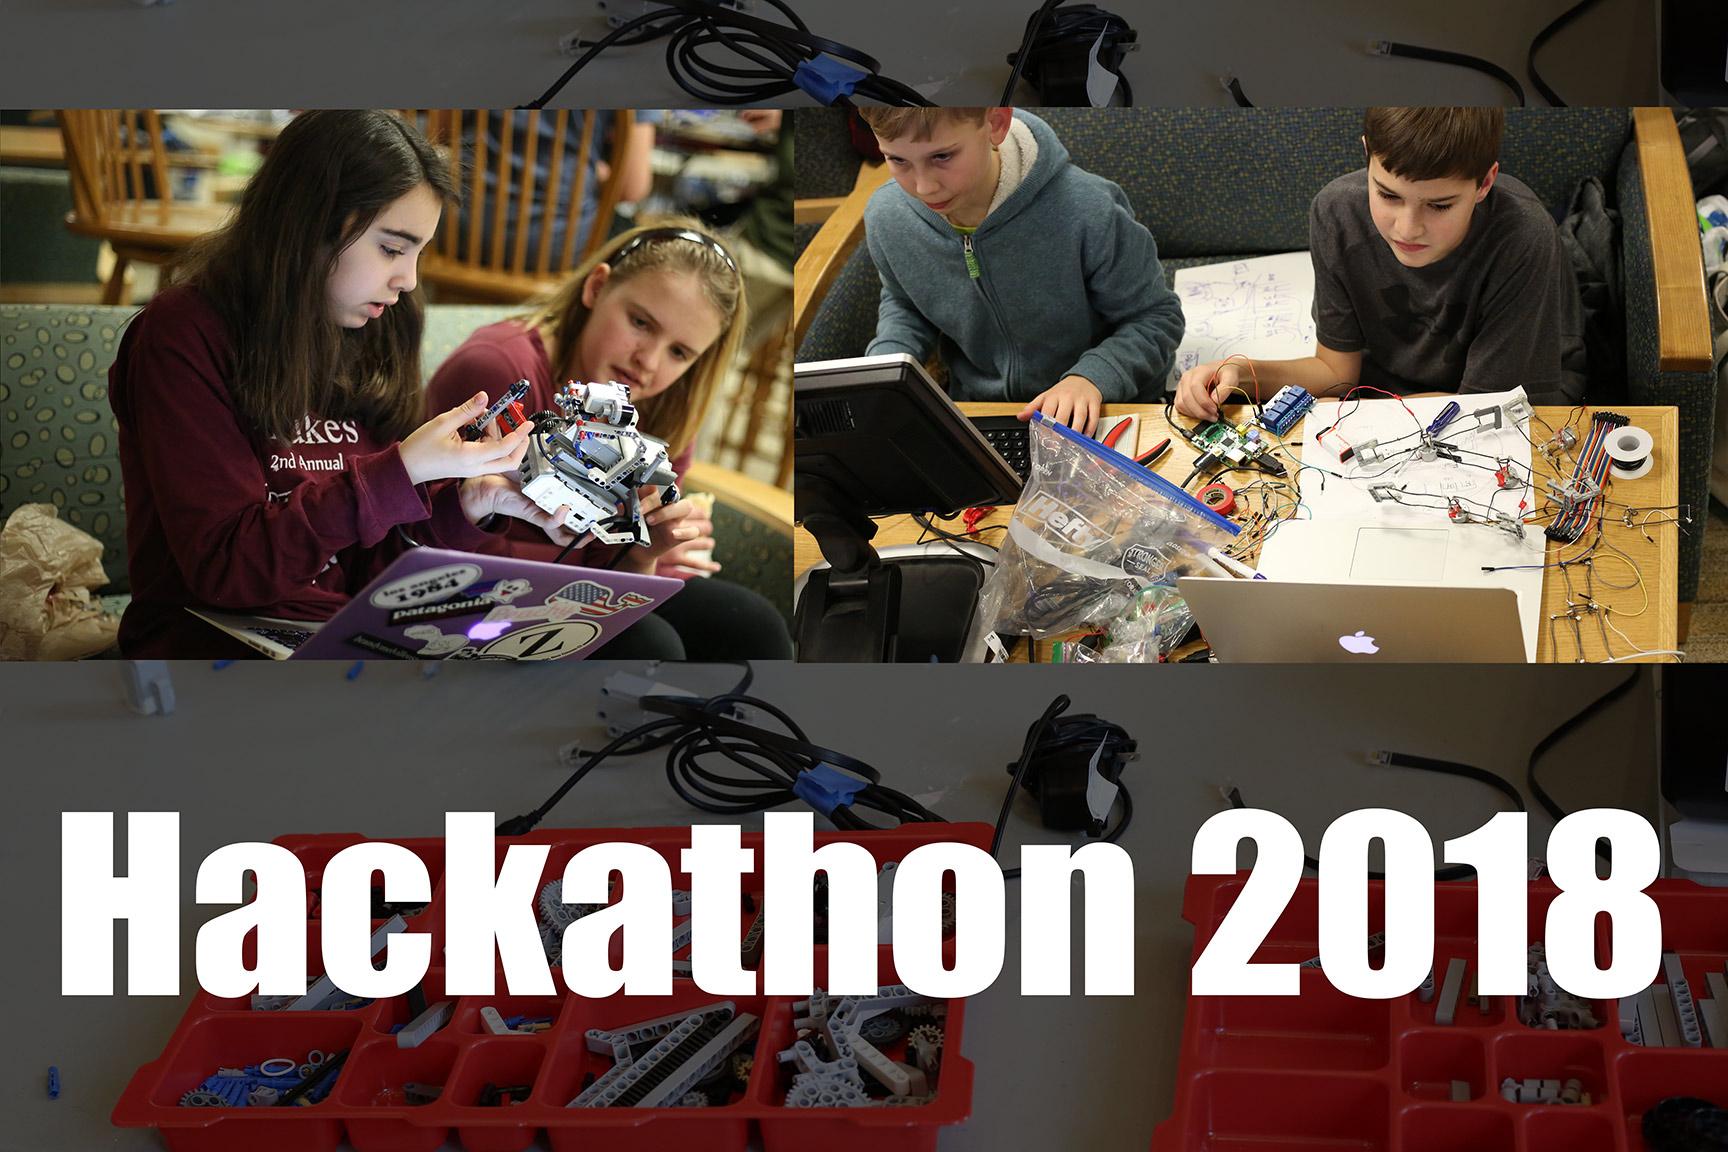 Hackathon 4.0: Where Students Code, Create, & Celebrate Wild Ideas